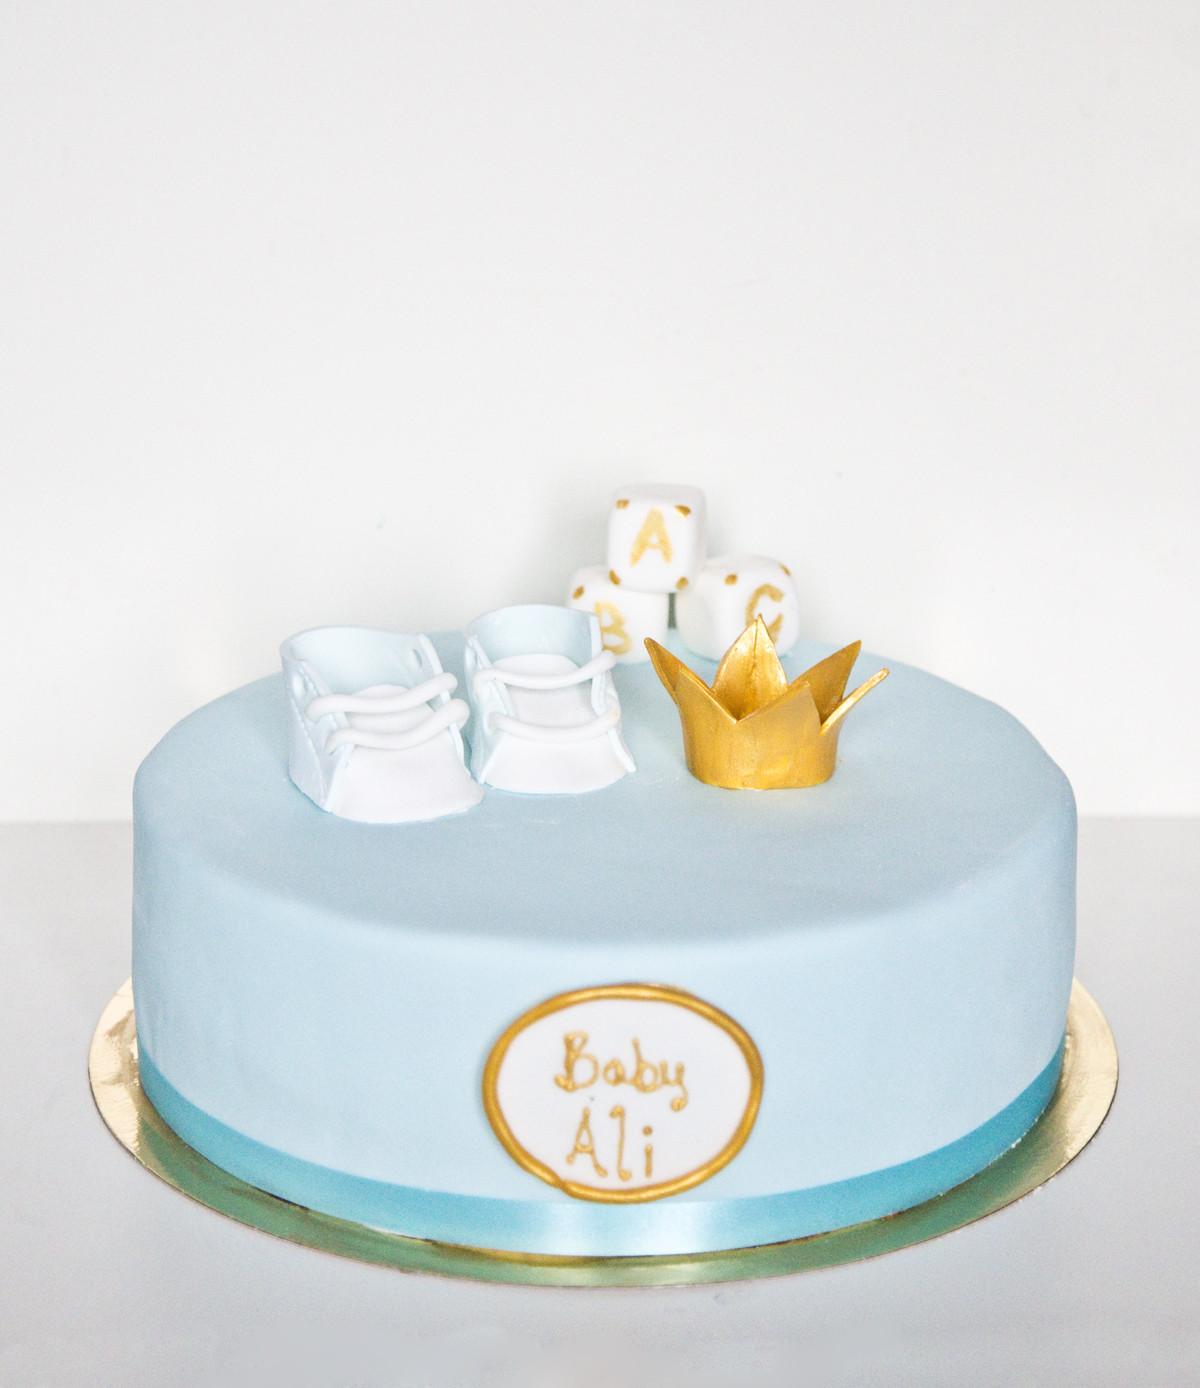 Baby Geburtstagstorte  Baby Junge Geburtstagstorte